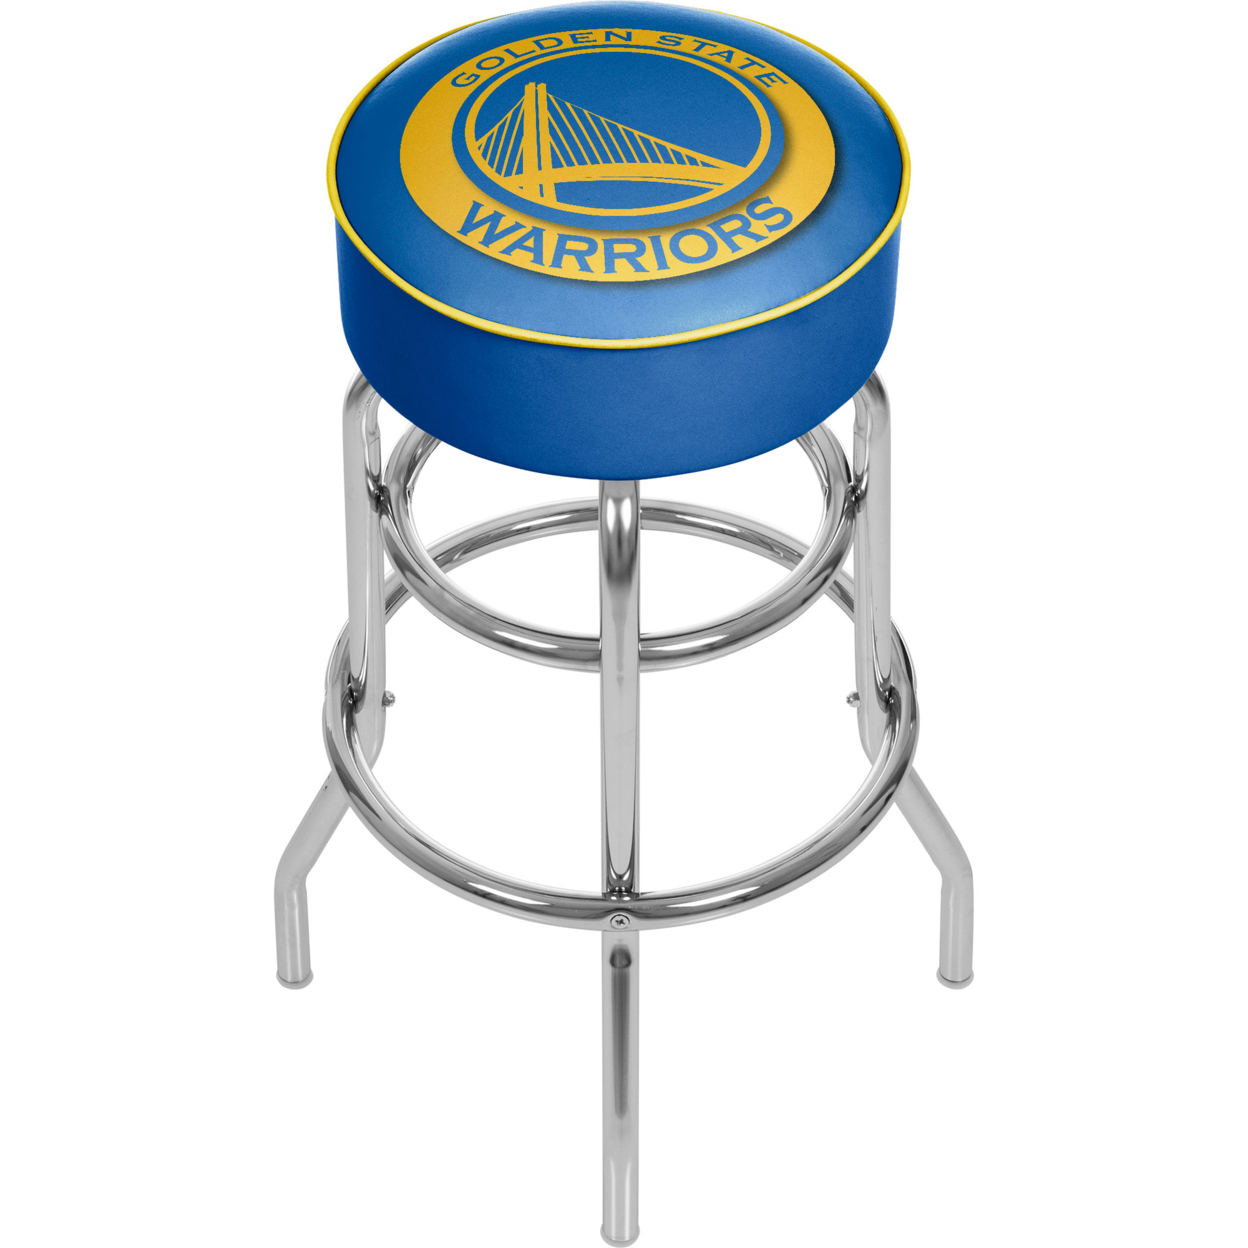 Golden State Warriors NBA Padded Swivel Bar Stool 30 Inches High nikko машина nissan skyline gtr r34 street warriors 1 10 901584 в перми